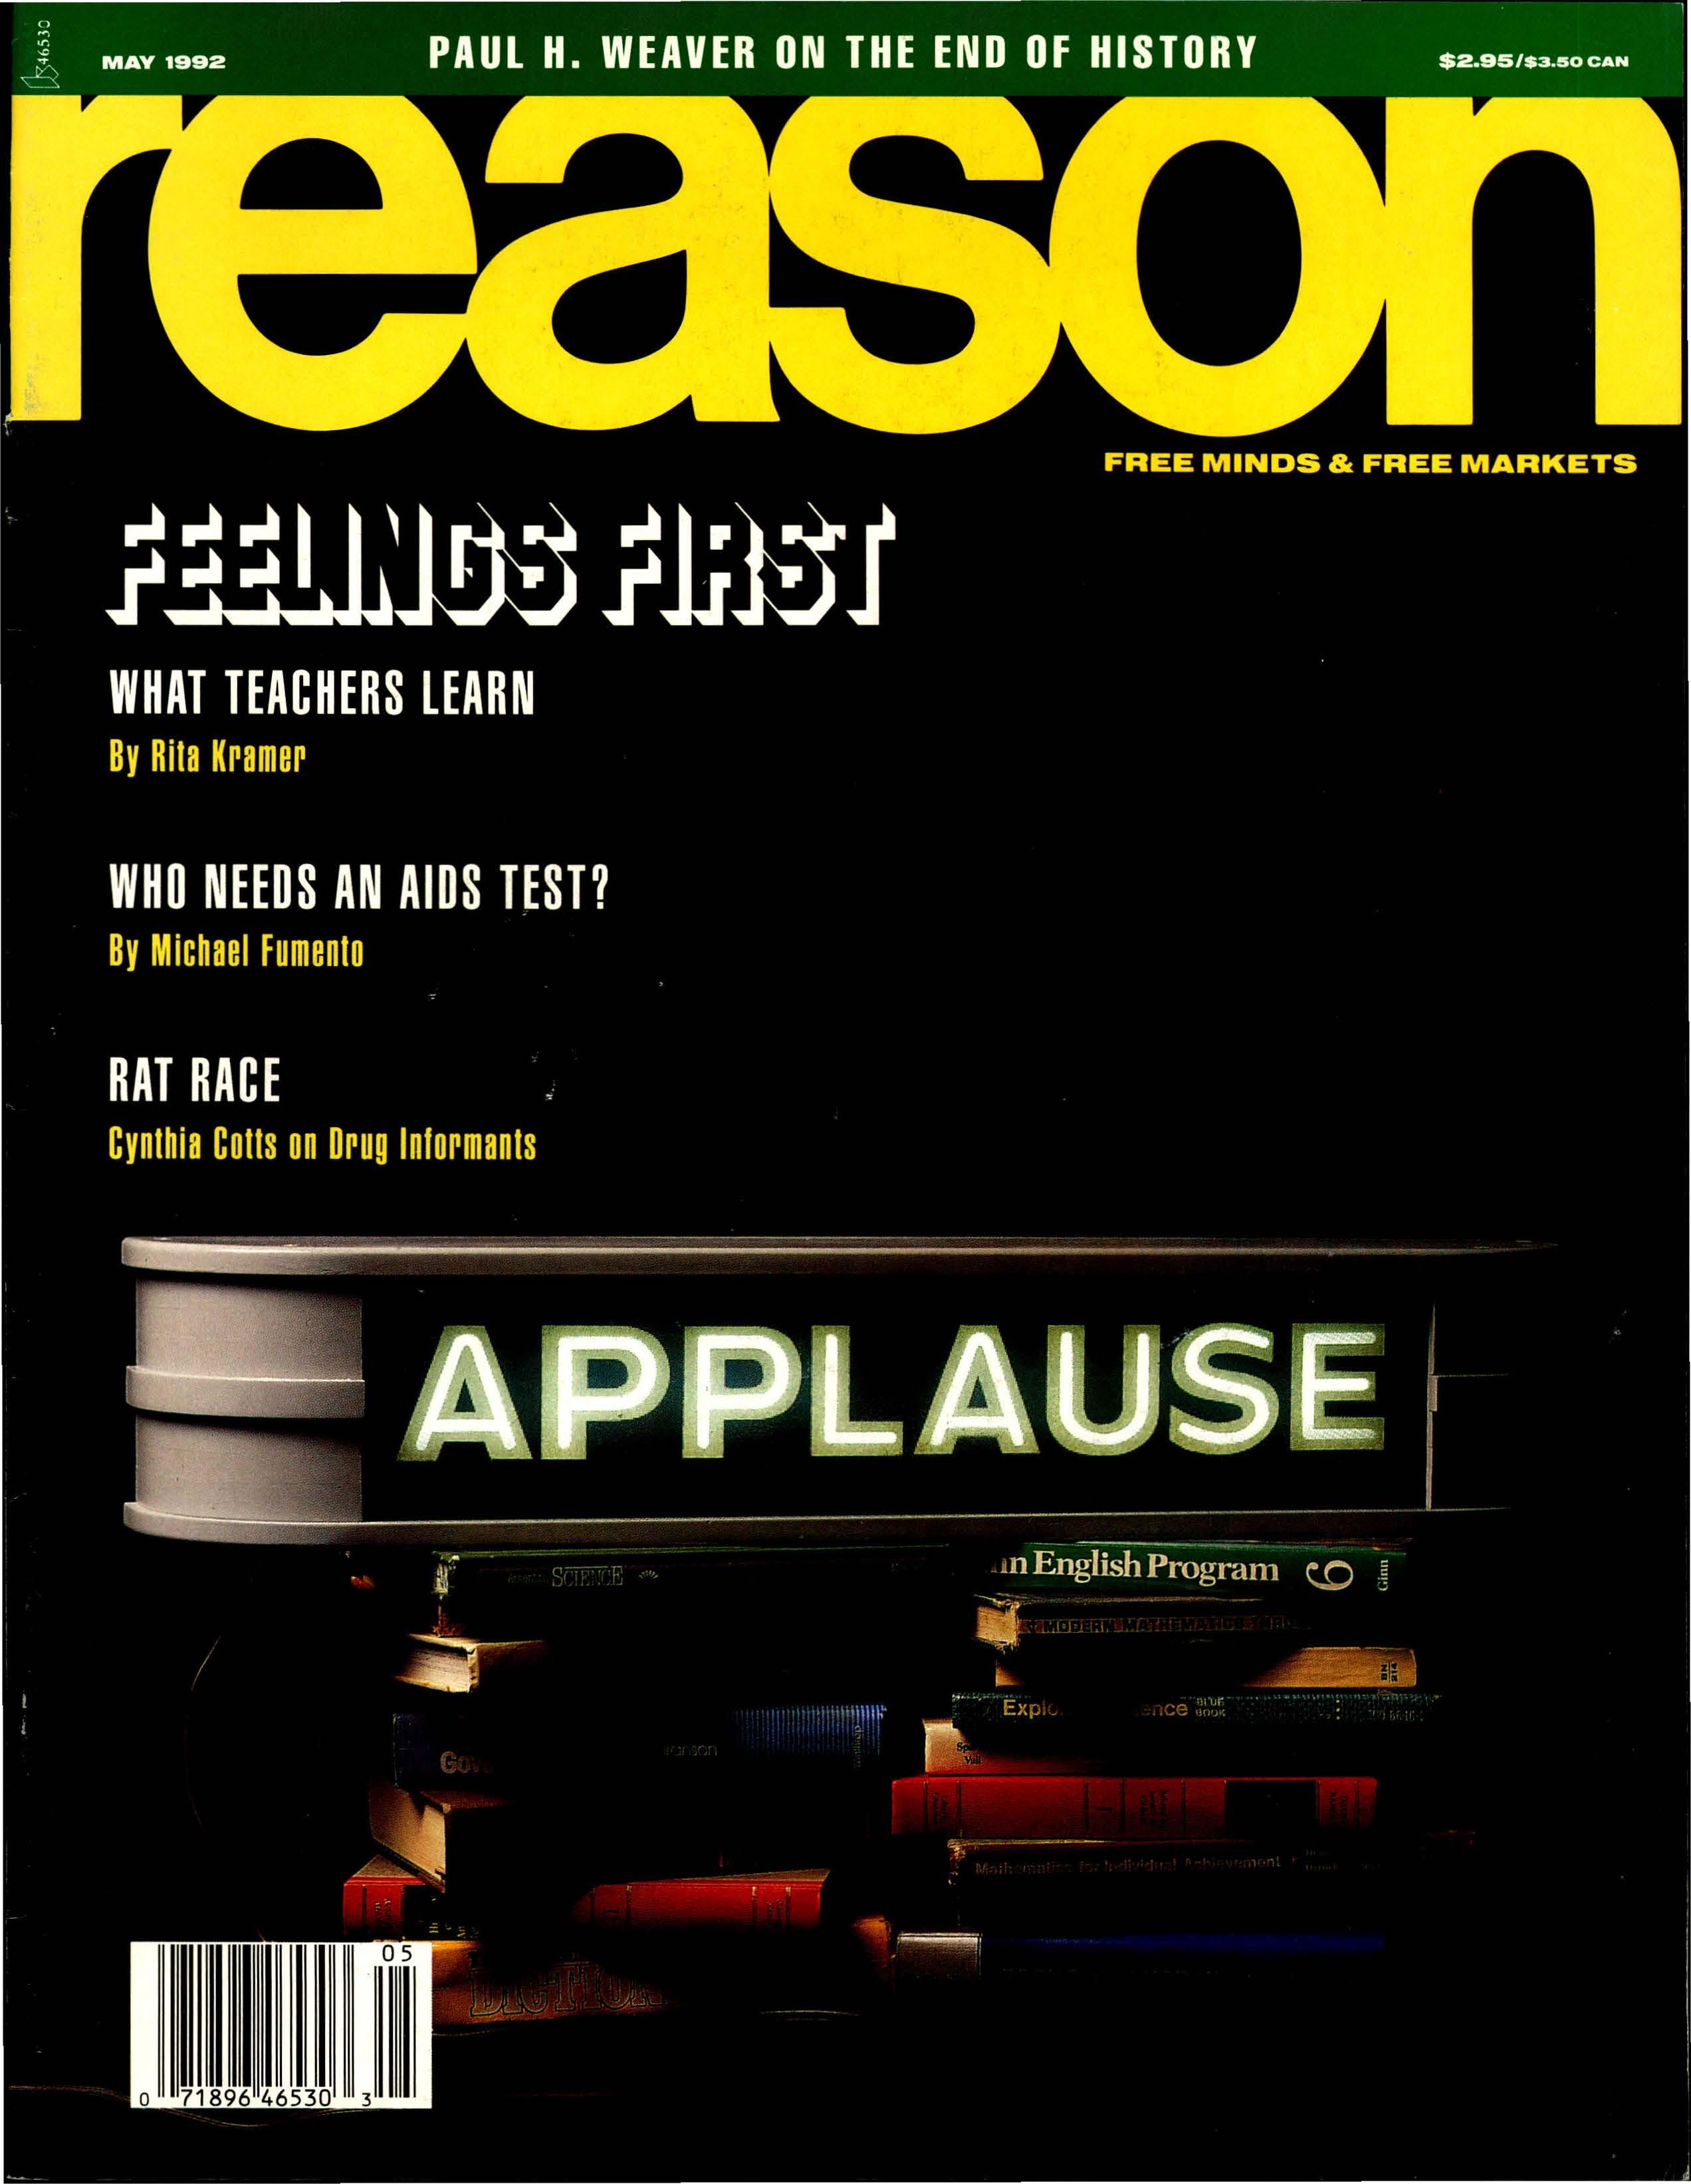 Reason Magazine, May 1992 cover image